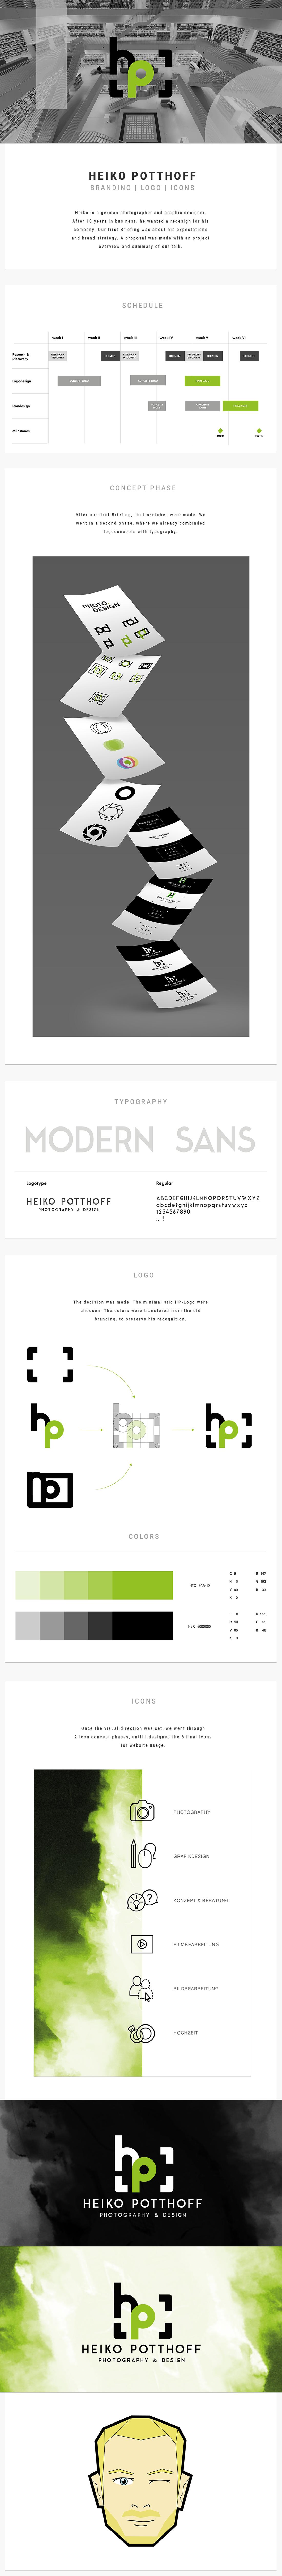 Slawikdesign-Heiko Potthoff- Branding, Logodesign und Icons-Portfolio 2017 Xing